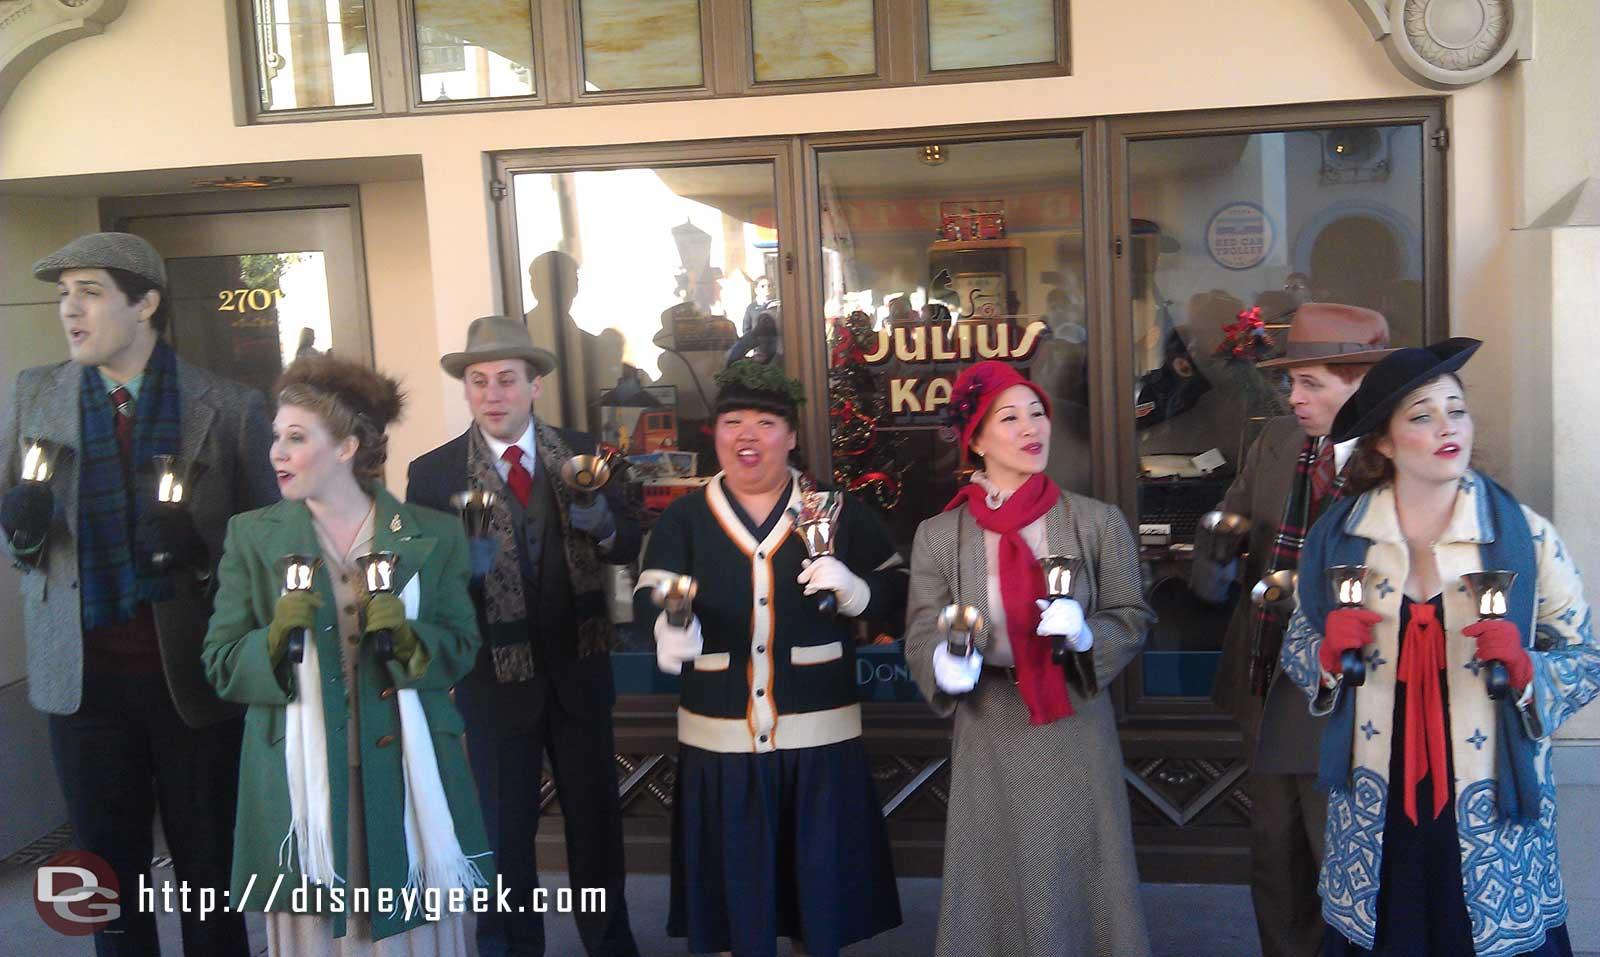 Buena Vista Street Community Bell Ringers